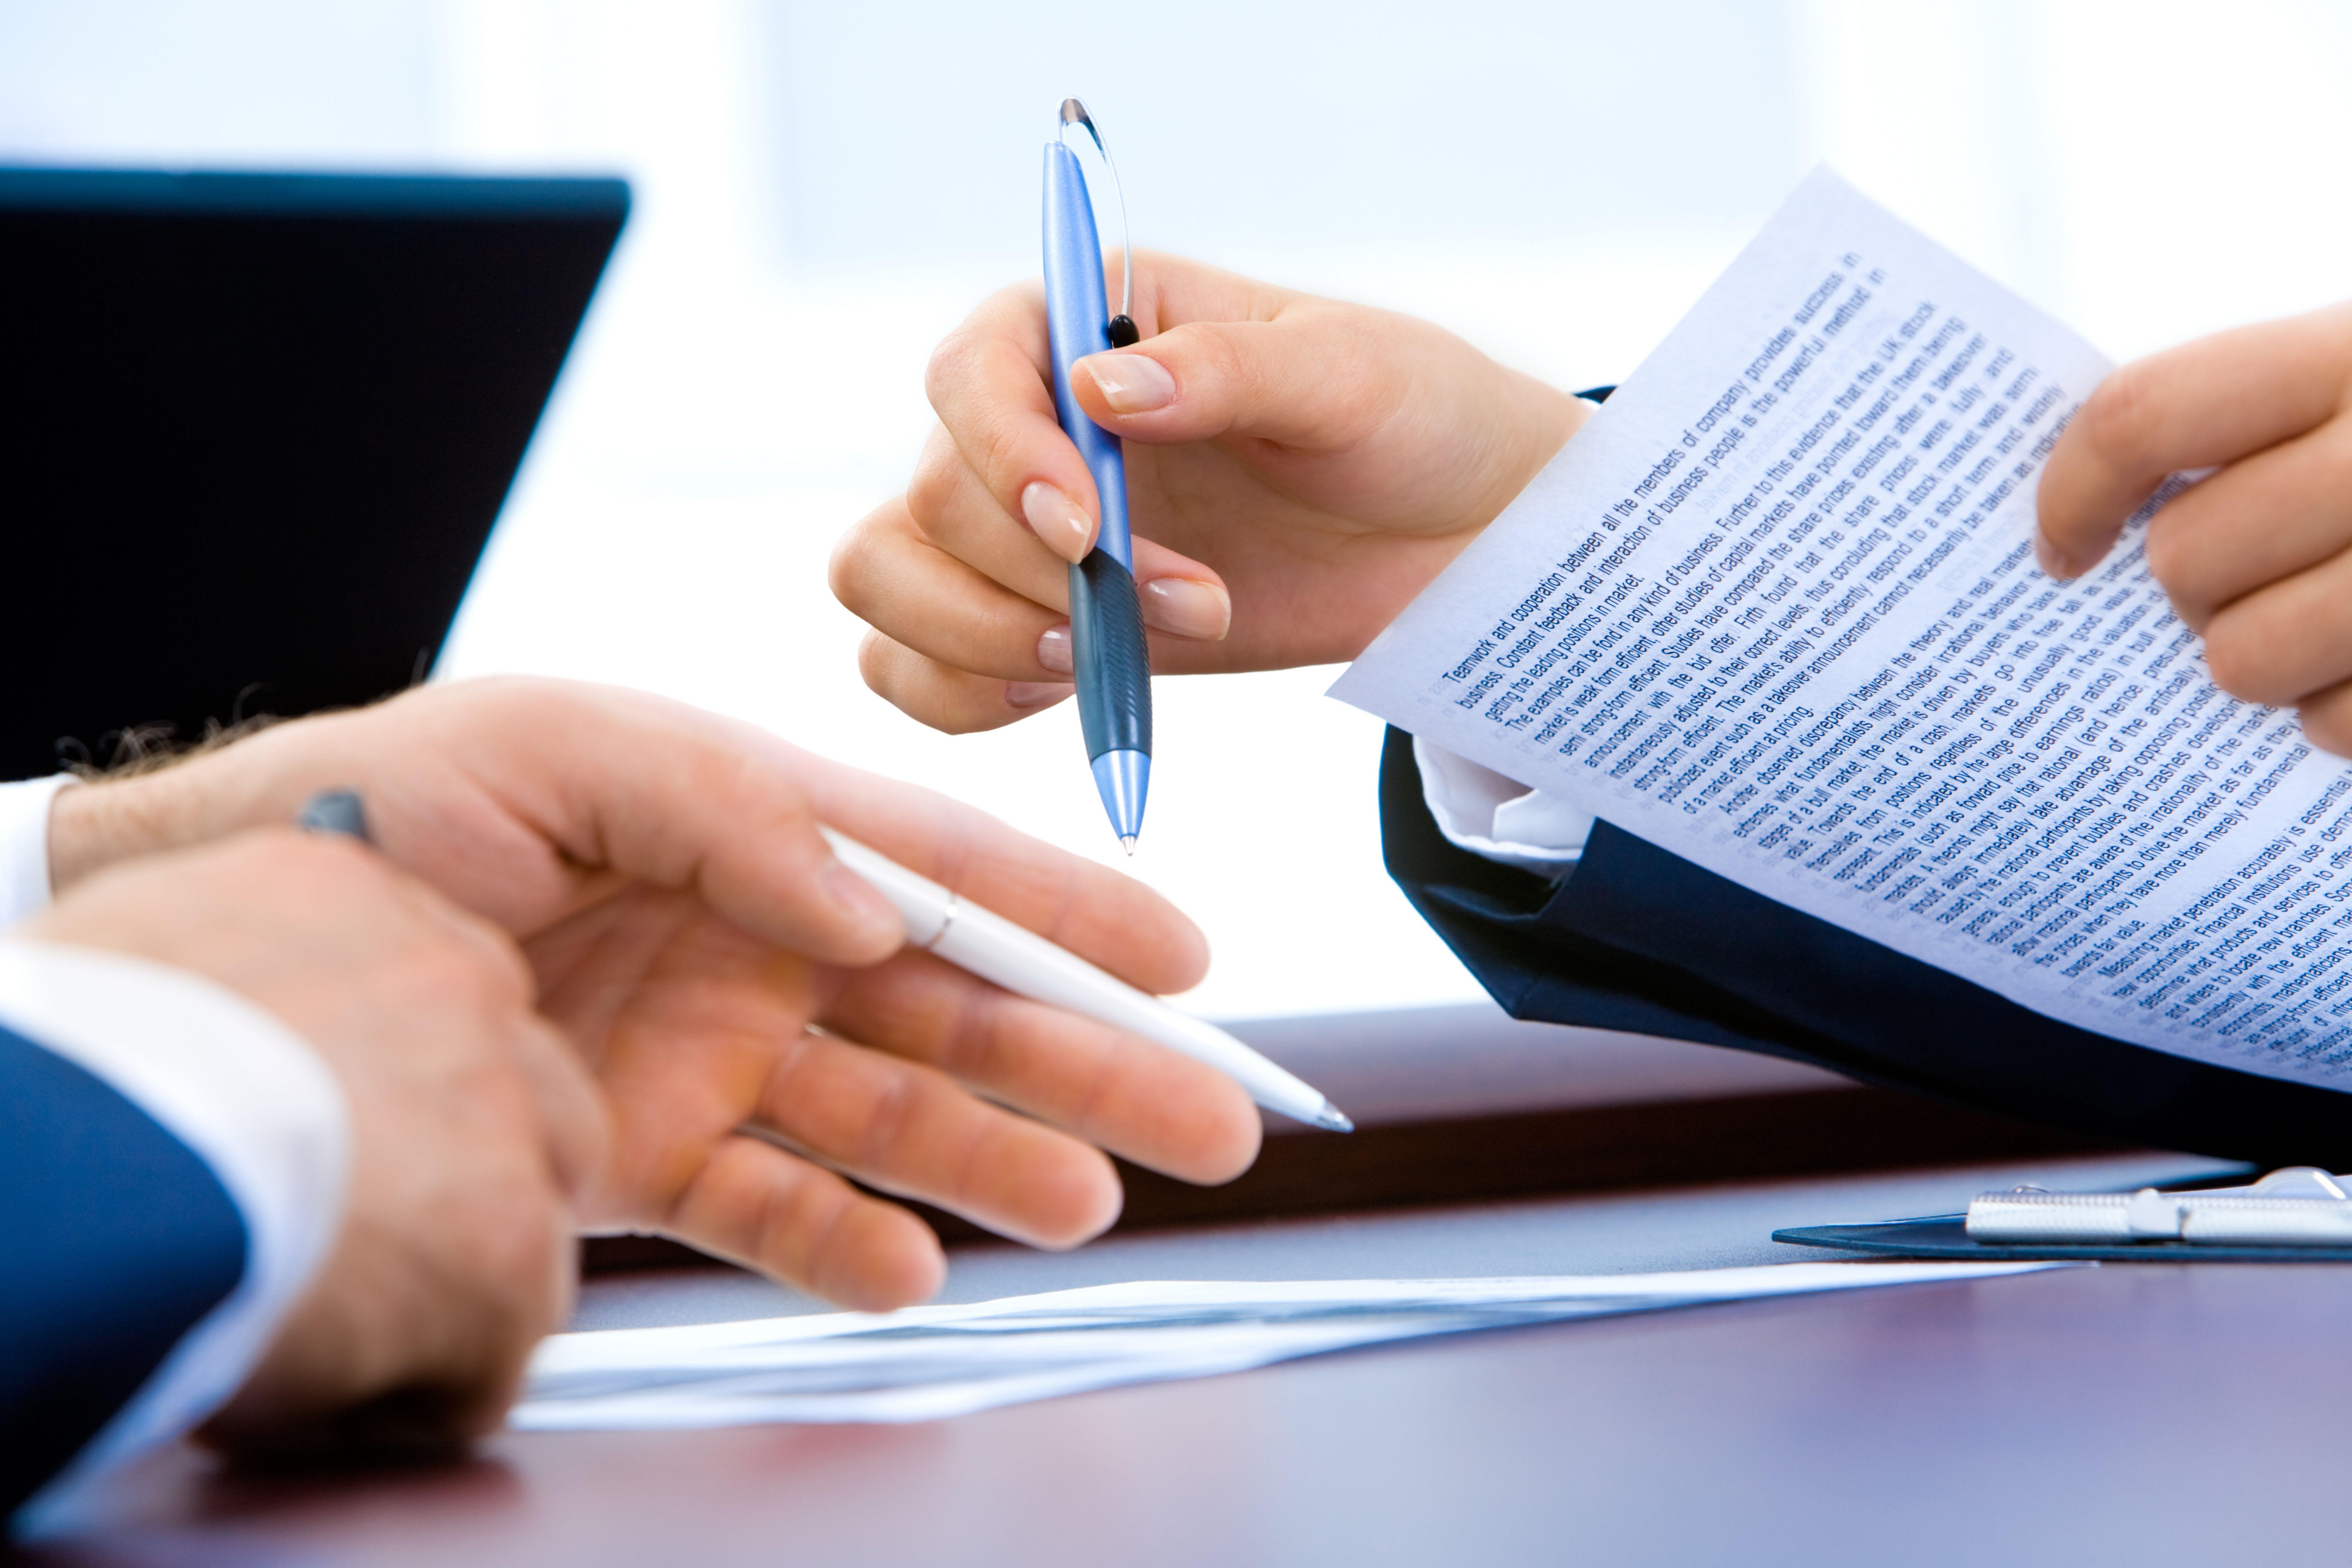 Titelbild-Recruiting-Bewerbung-Bewerber-Vertrag-Abschluss-3196481-pixabay-Aymanjed